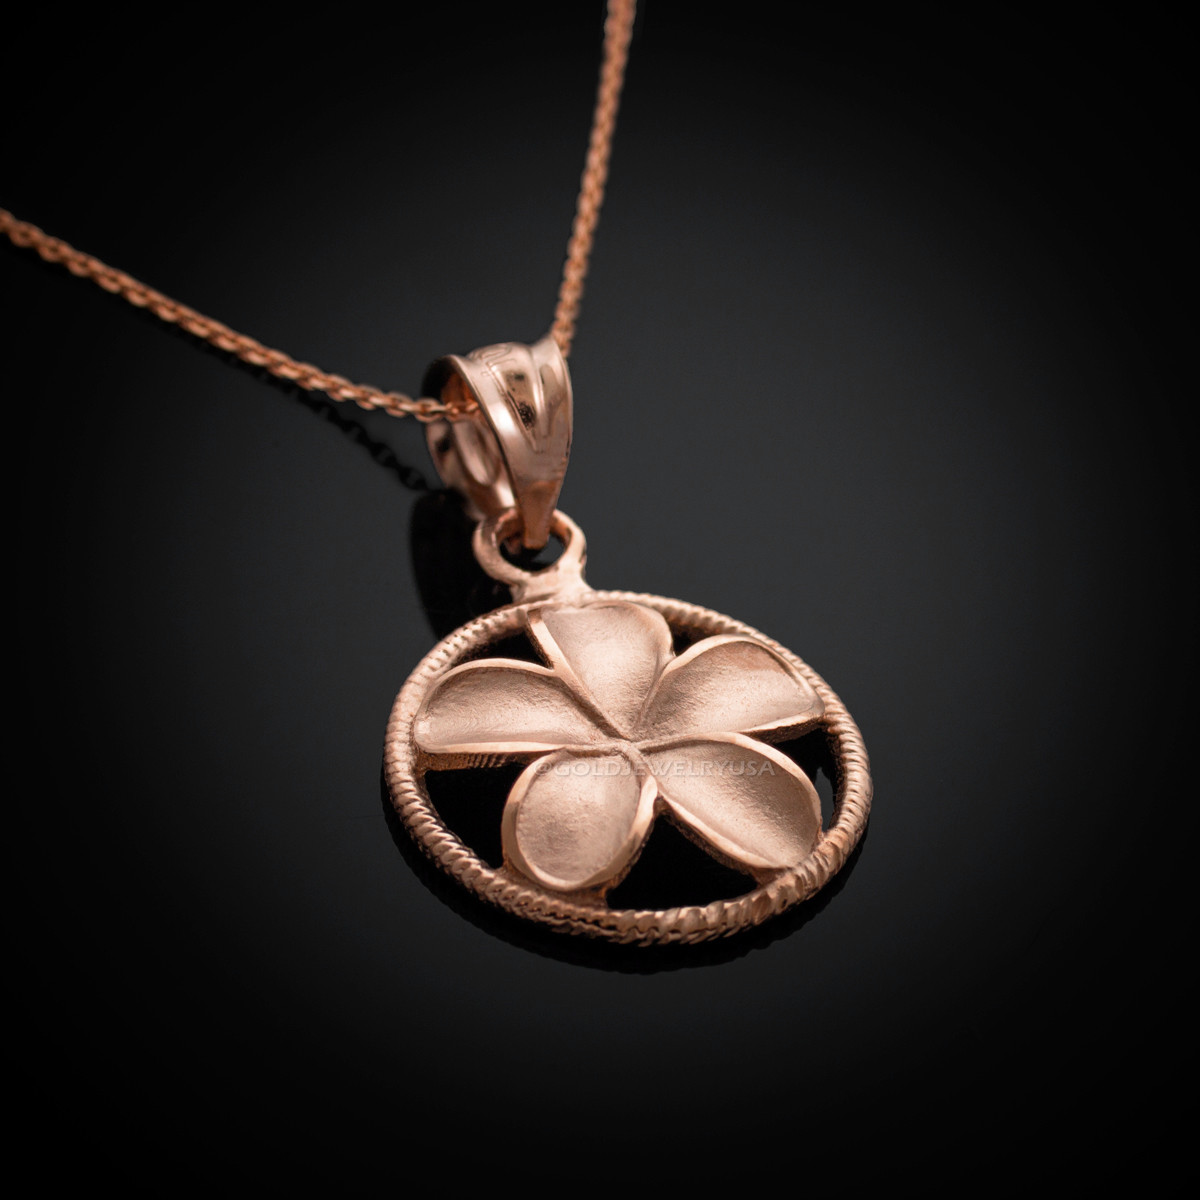 Rose Gold Hawaiian Plumeria Flower Charm Necklace